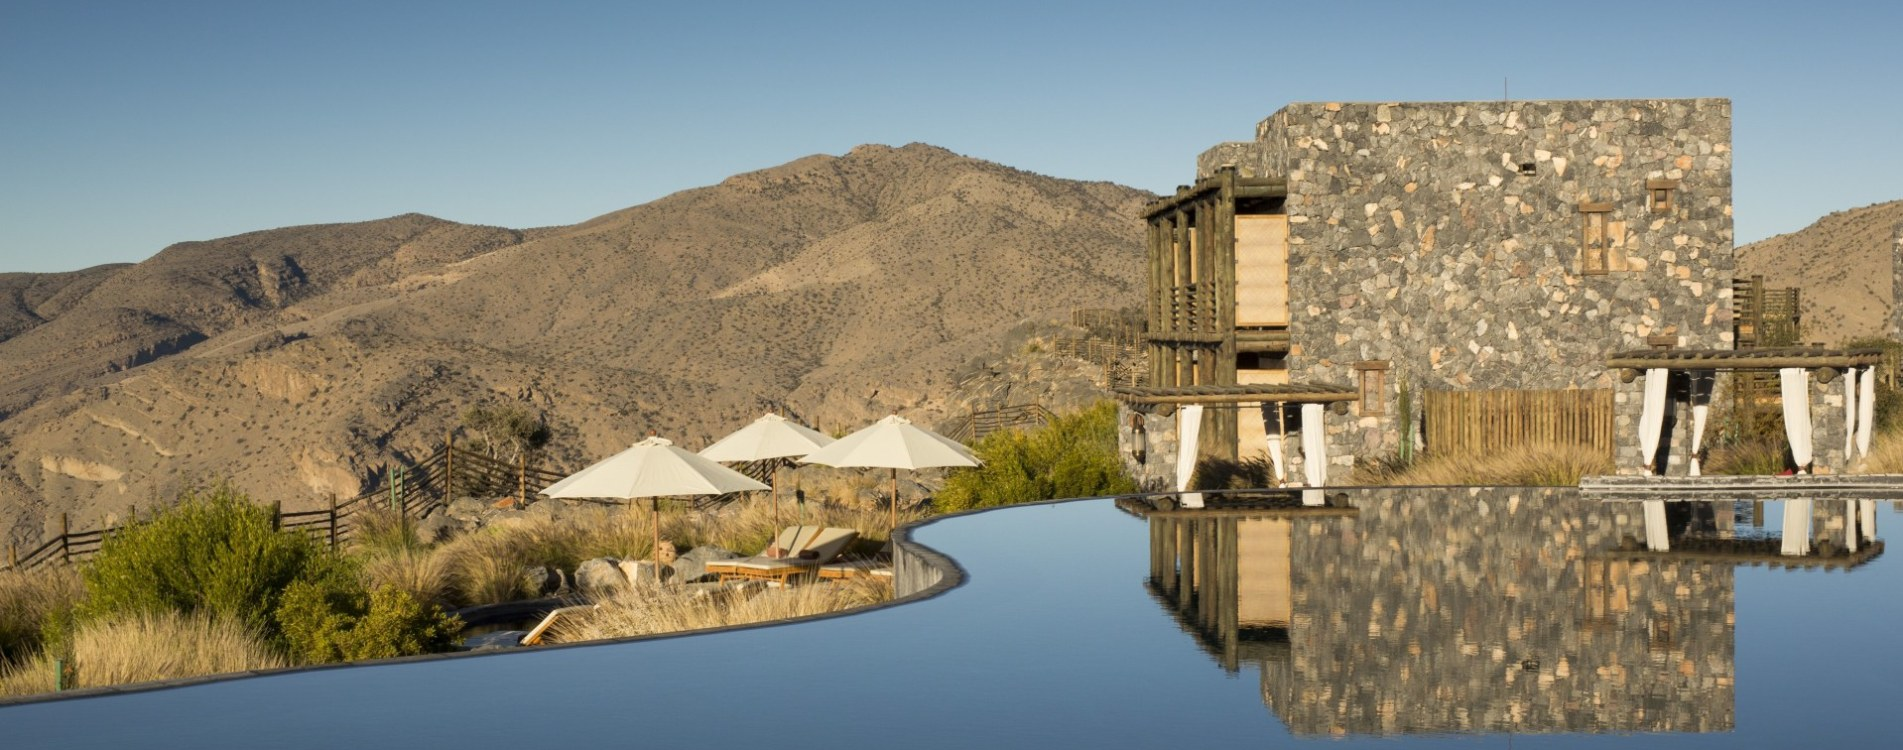 Alila-Jabal-Akhdar-Infinity-Pool-Gebäude-Exterior-Oman.JPG